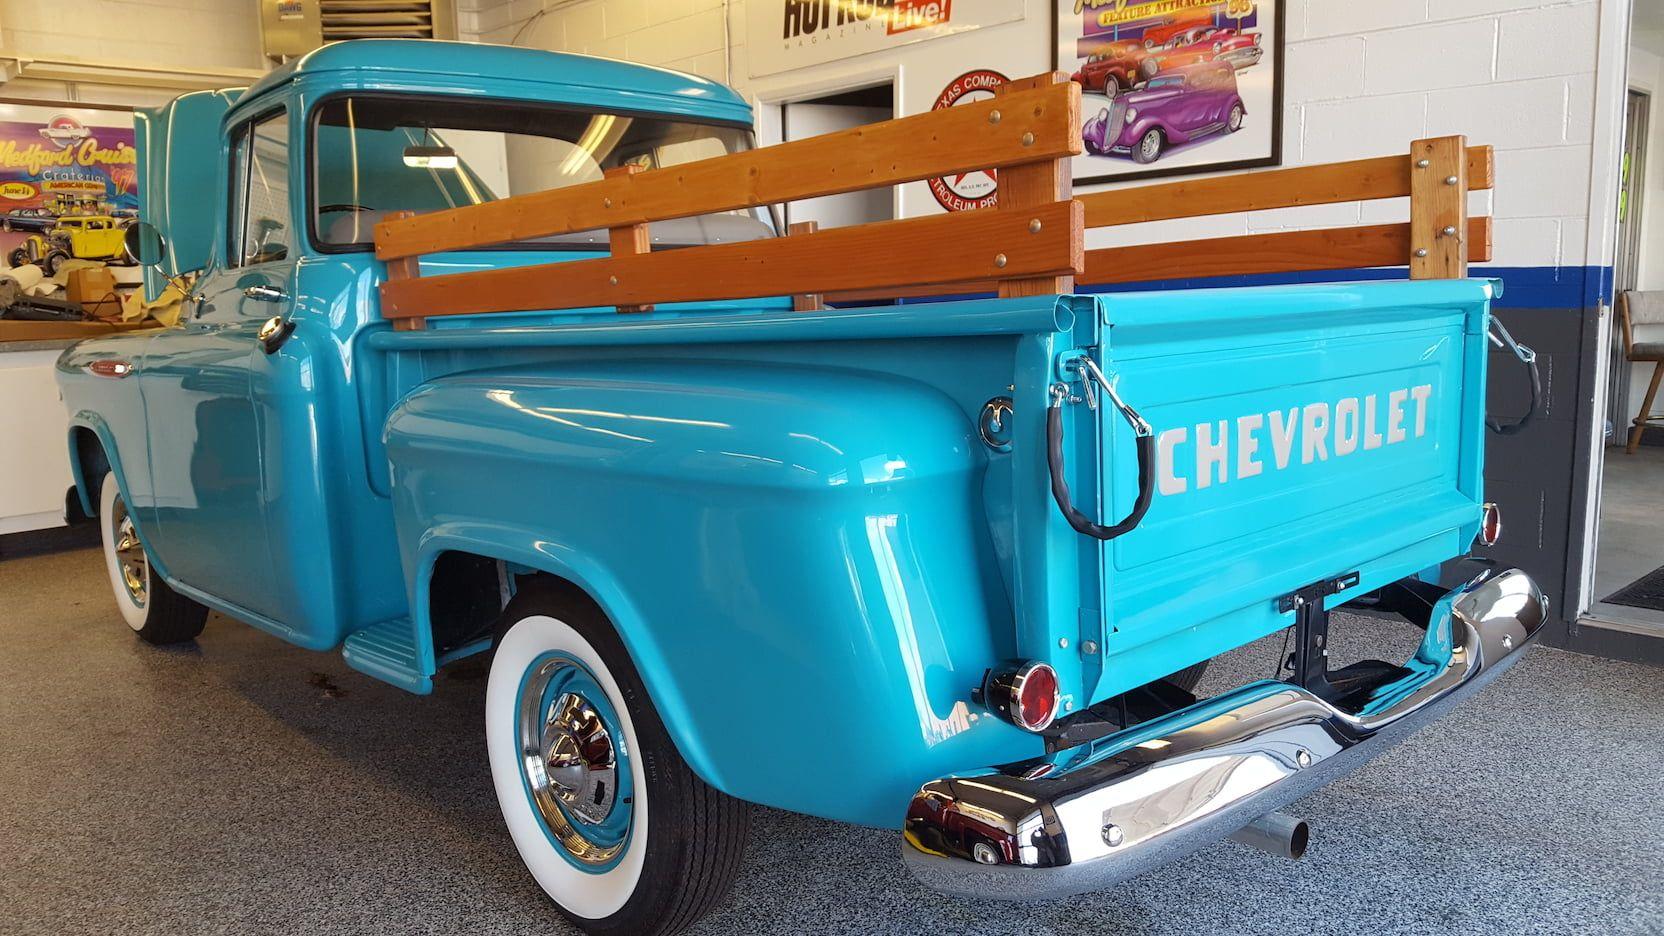 1957 Chevrolet 3100 Pickup S125 Portland 2019 Chevrolet 3100 1957 Chevrolet Chevrolet